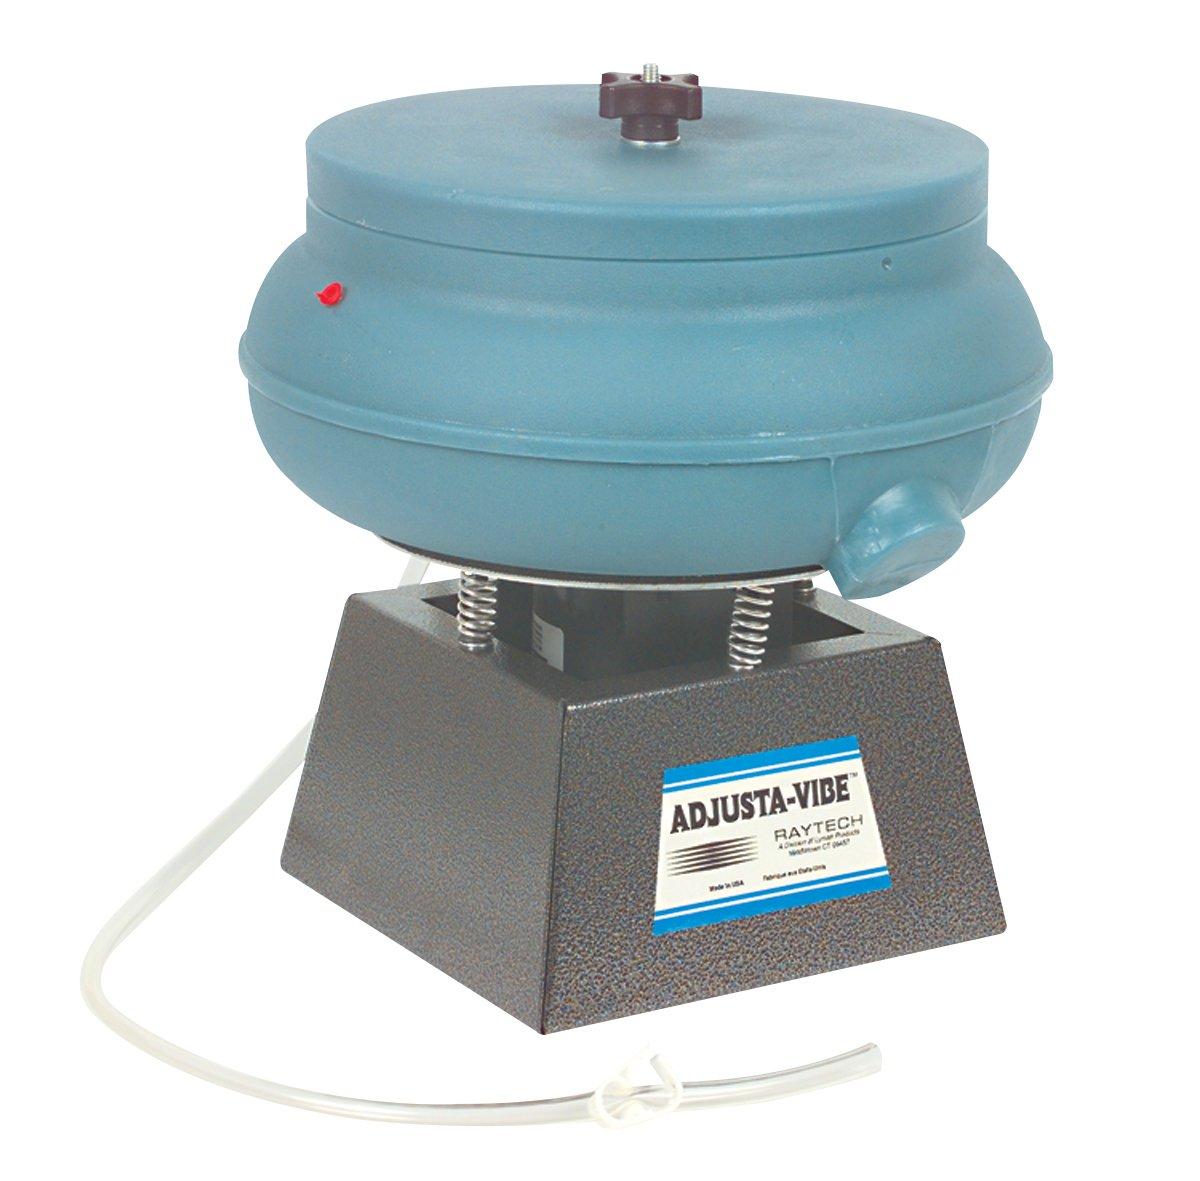 Raytech AV-25 Vibratory Tumbler, Cleaning & Maintenance Products ...